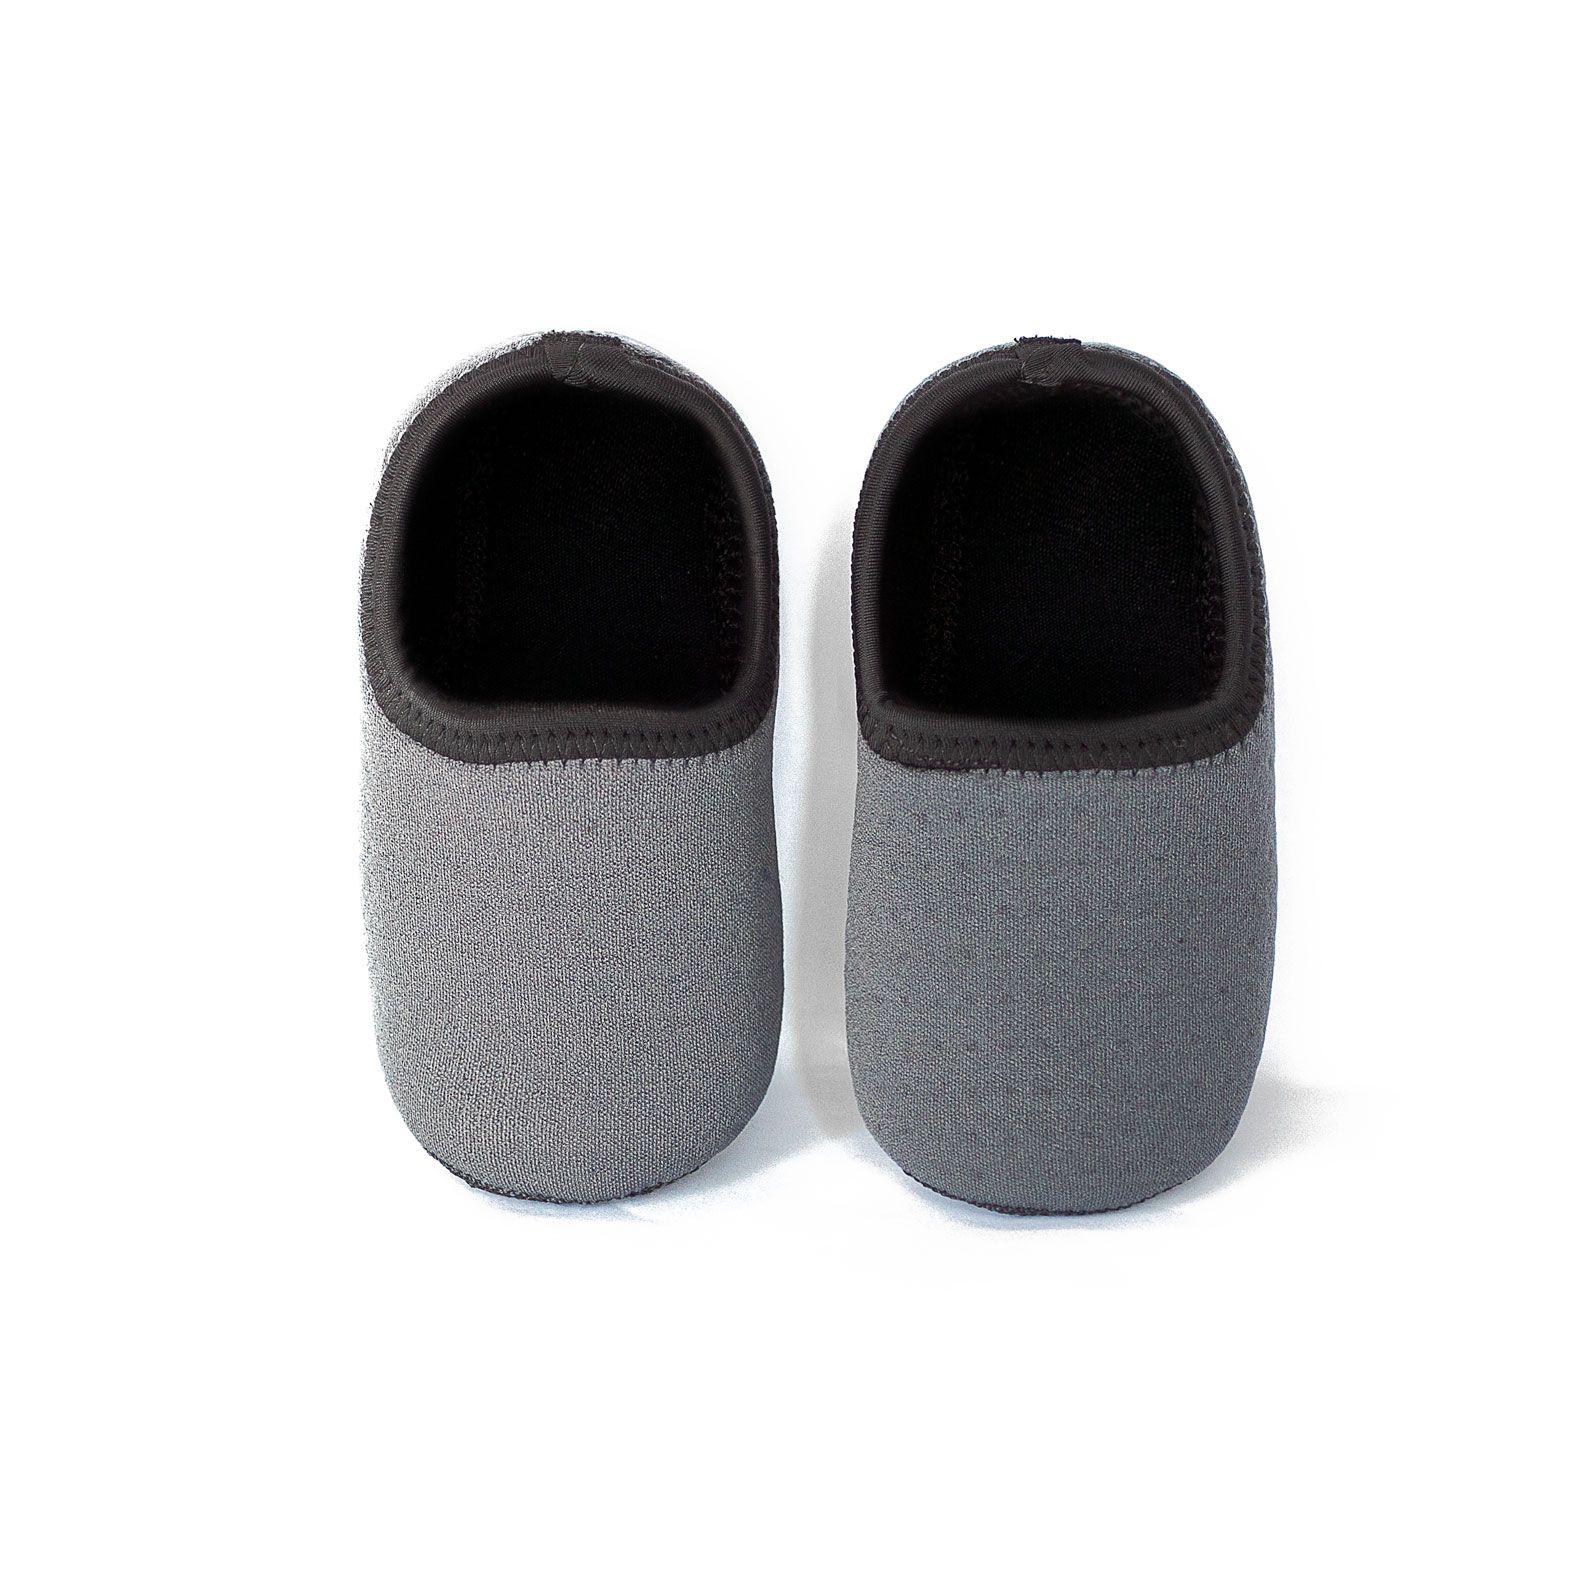 Sapato de Neoprene Infantil Fit Grafite Ufrog